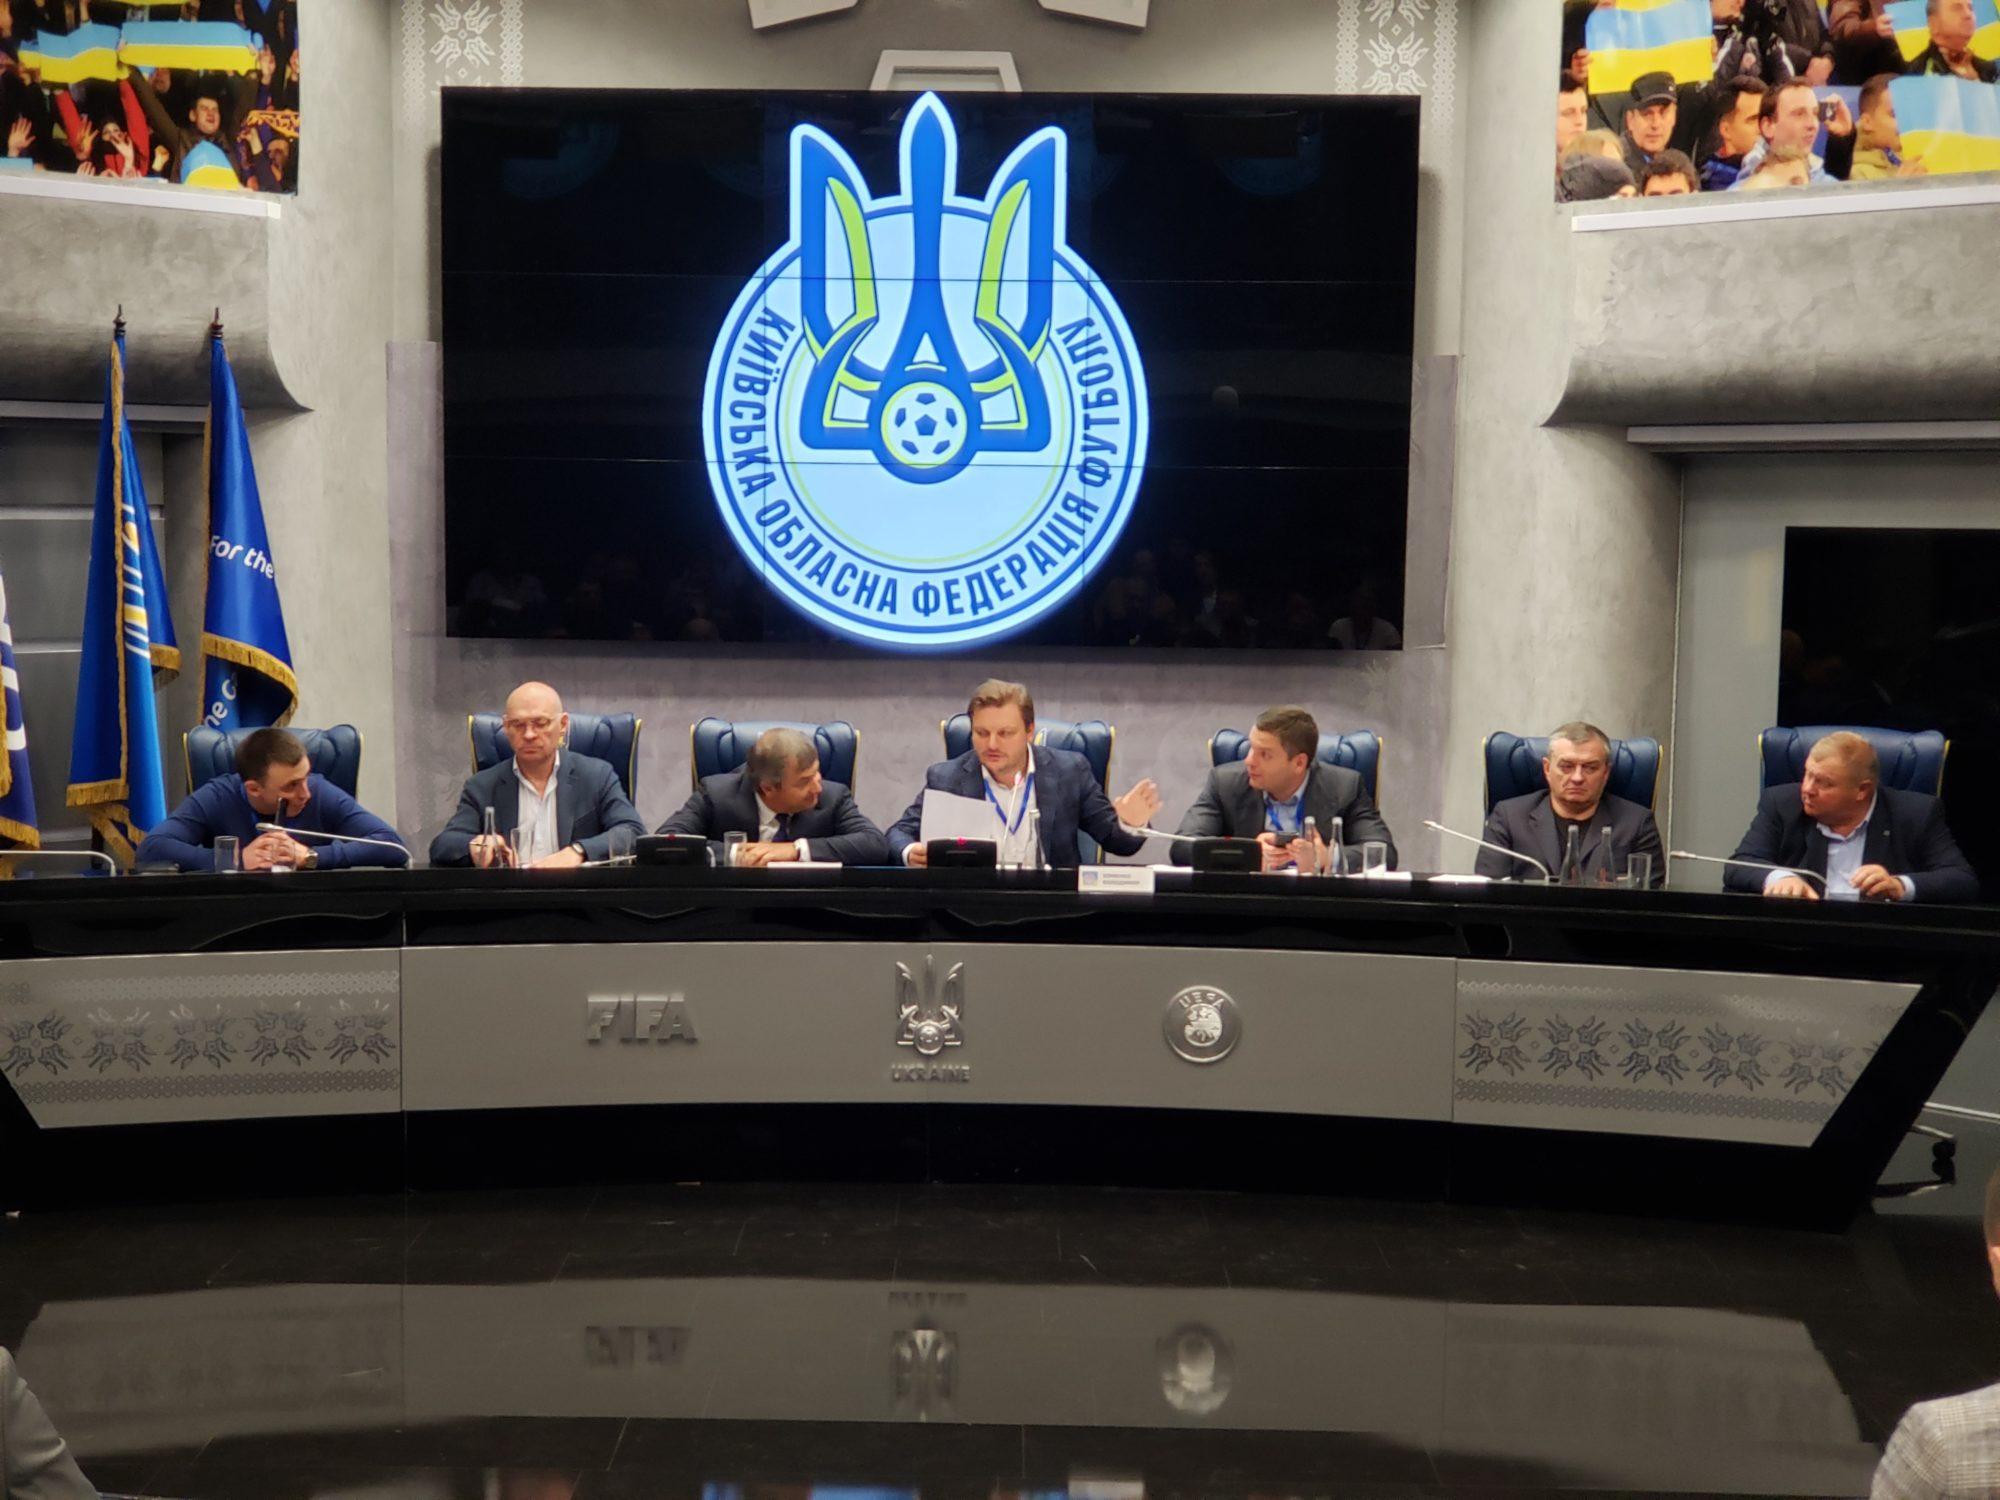 Обрано нового очільника Київщини футбольної -  - 20200118 134103 2000x1500